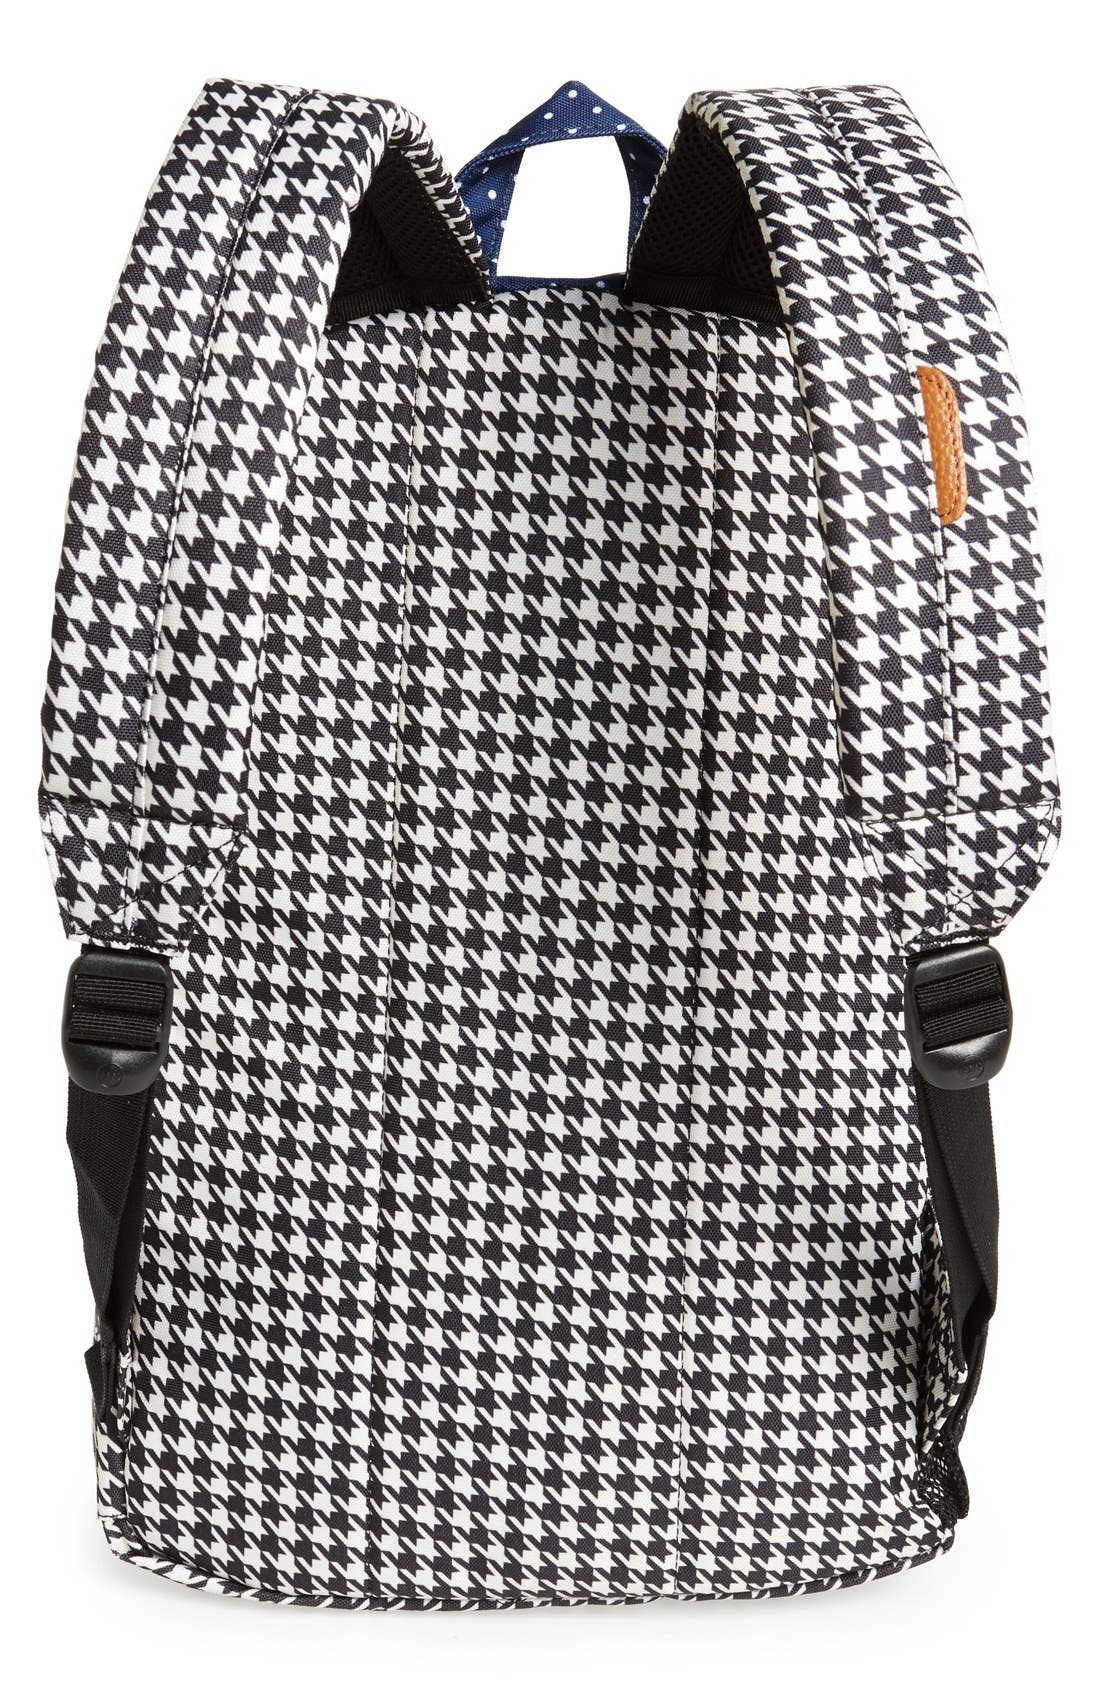 Alternate Image 2  - Herschel Supply Co. 'Jasper' Backpack